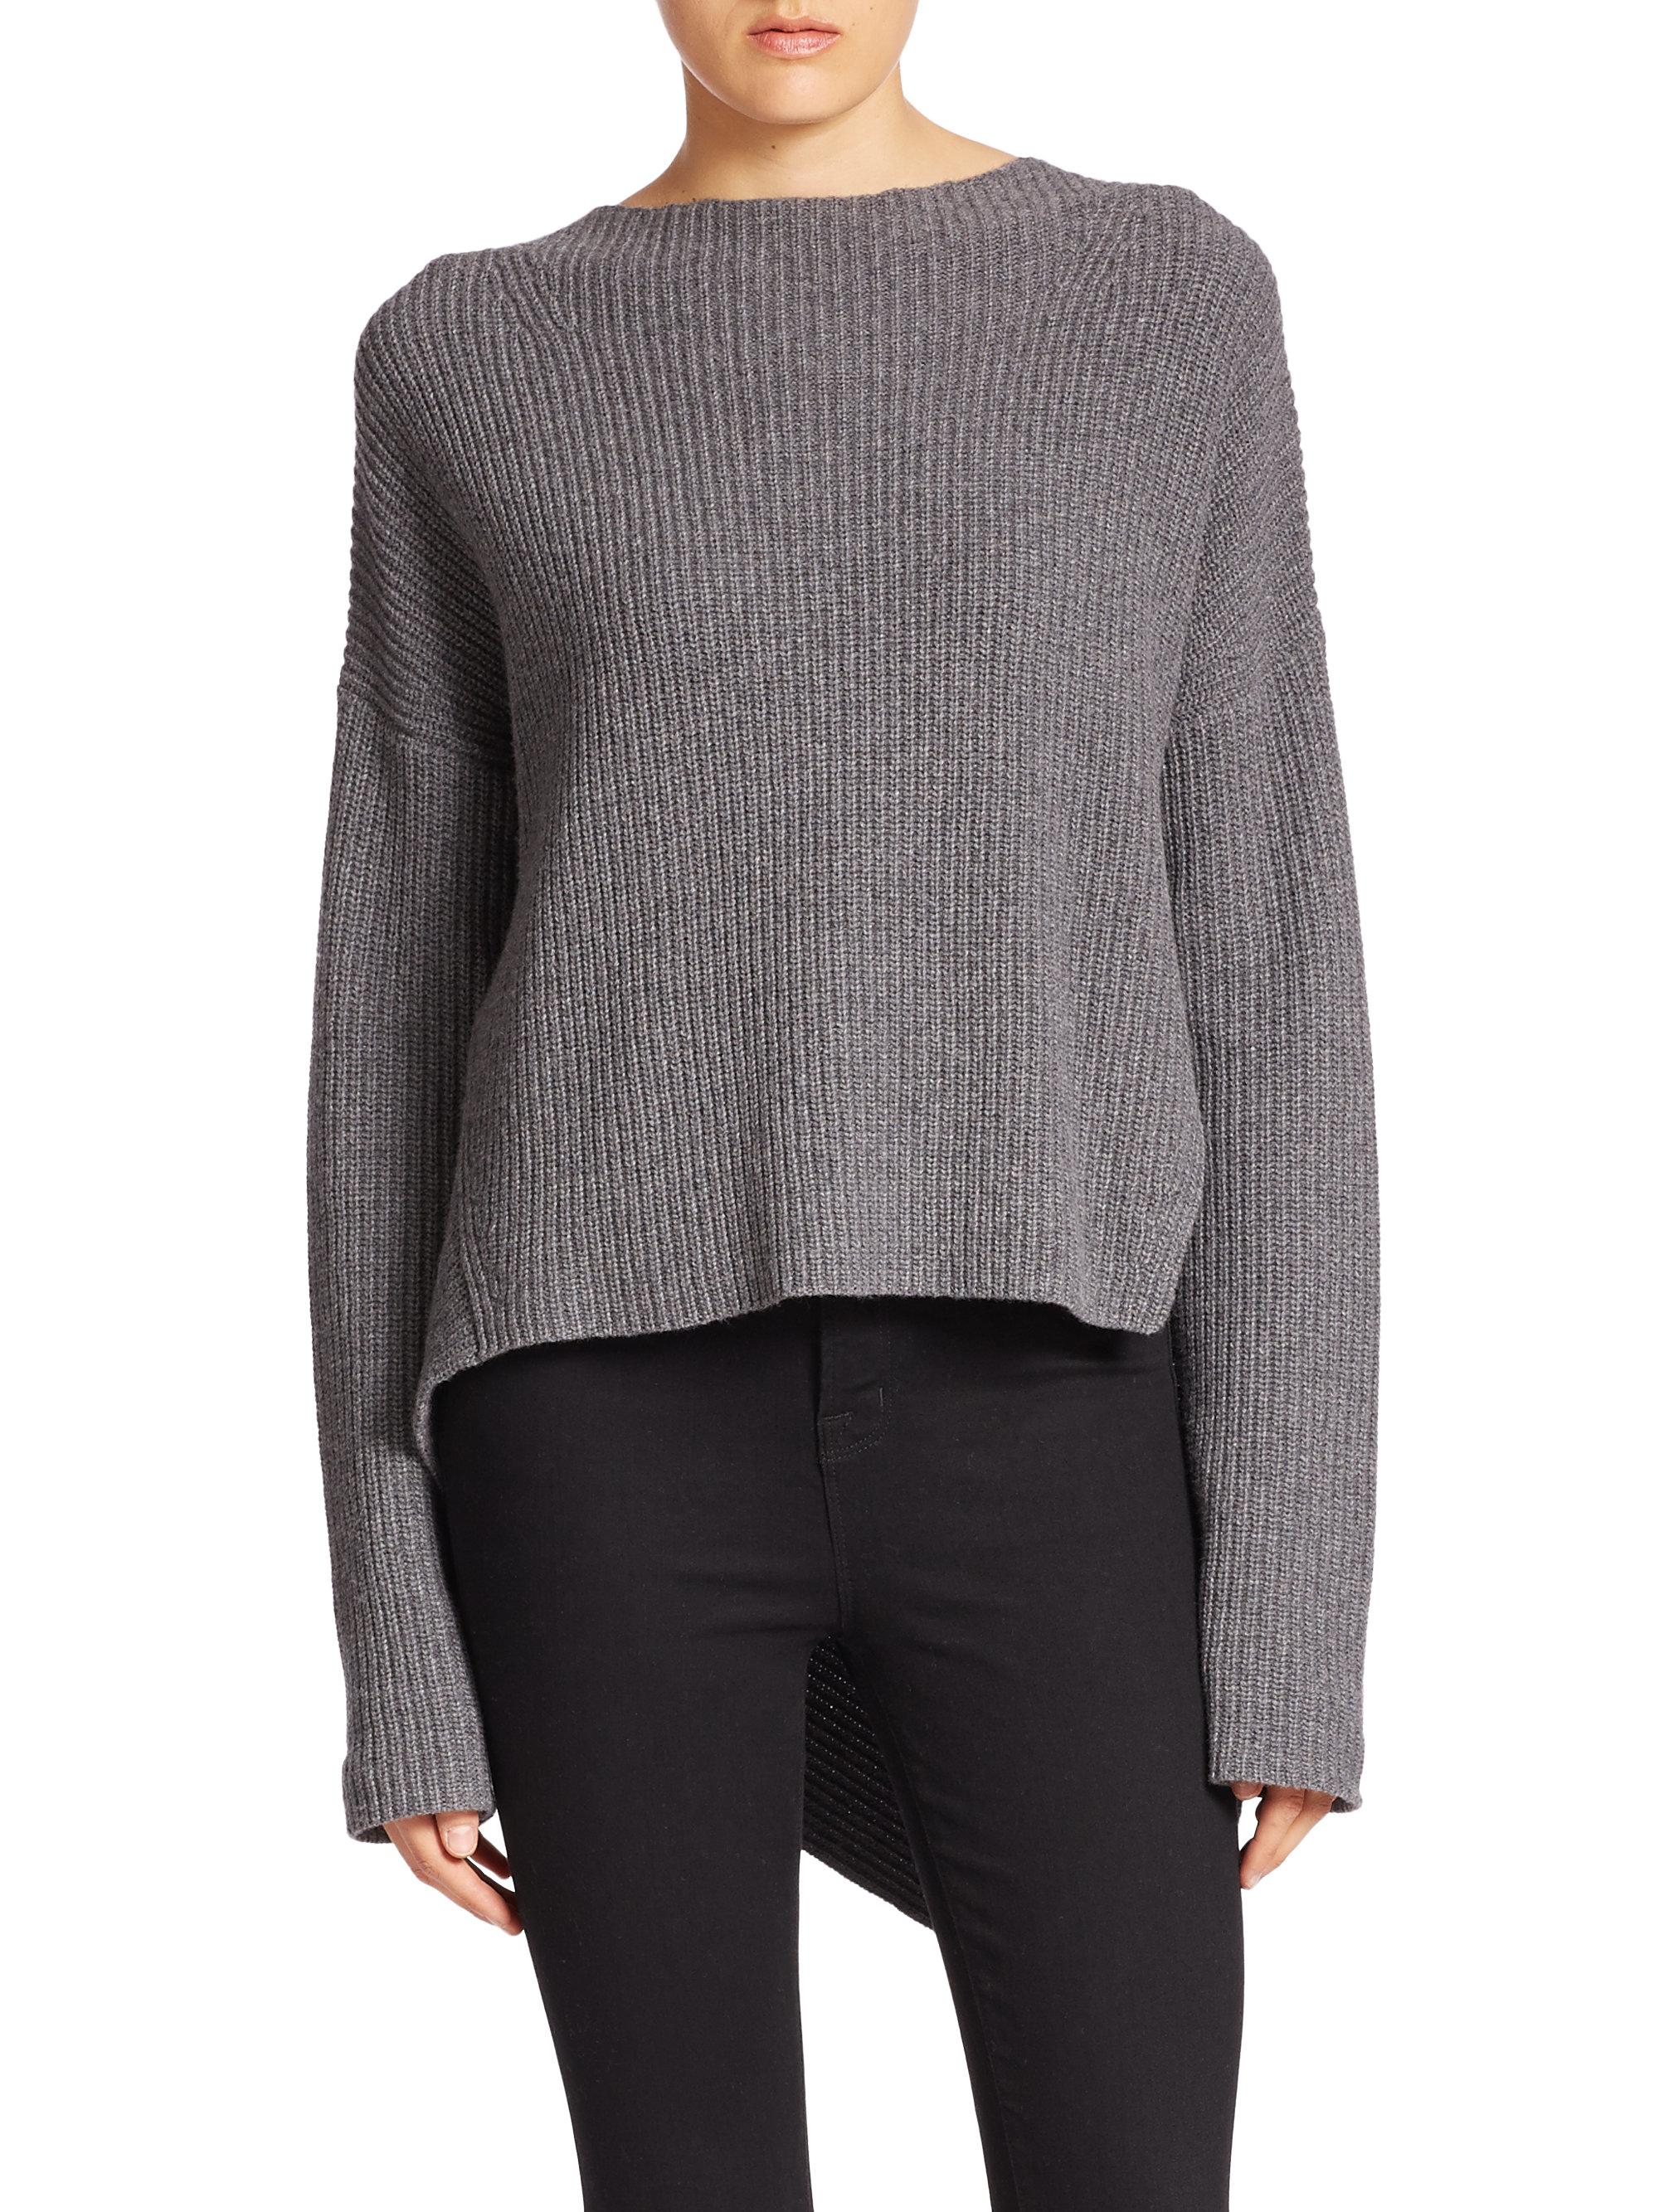 02e543137a7a45 Lyst - Brochu Walker Thandee Ribbed Asymmetrical Sweater in Gray